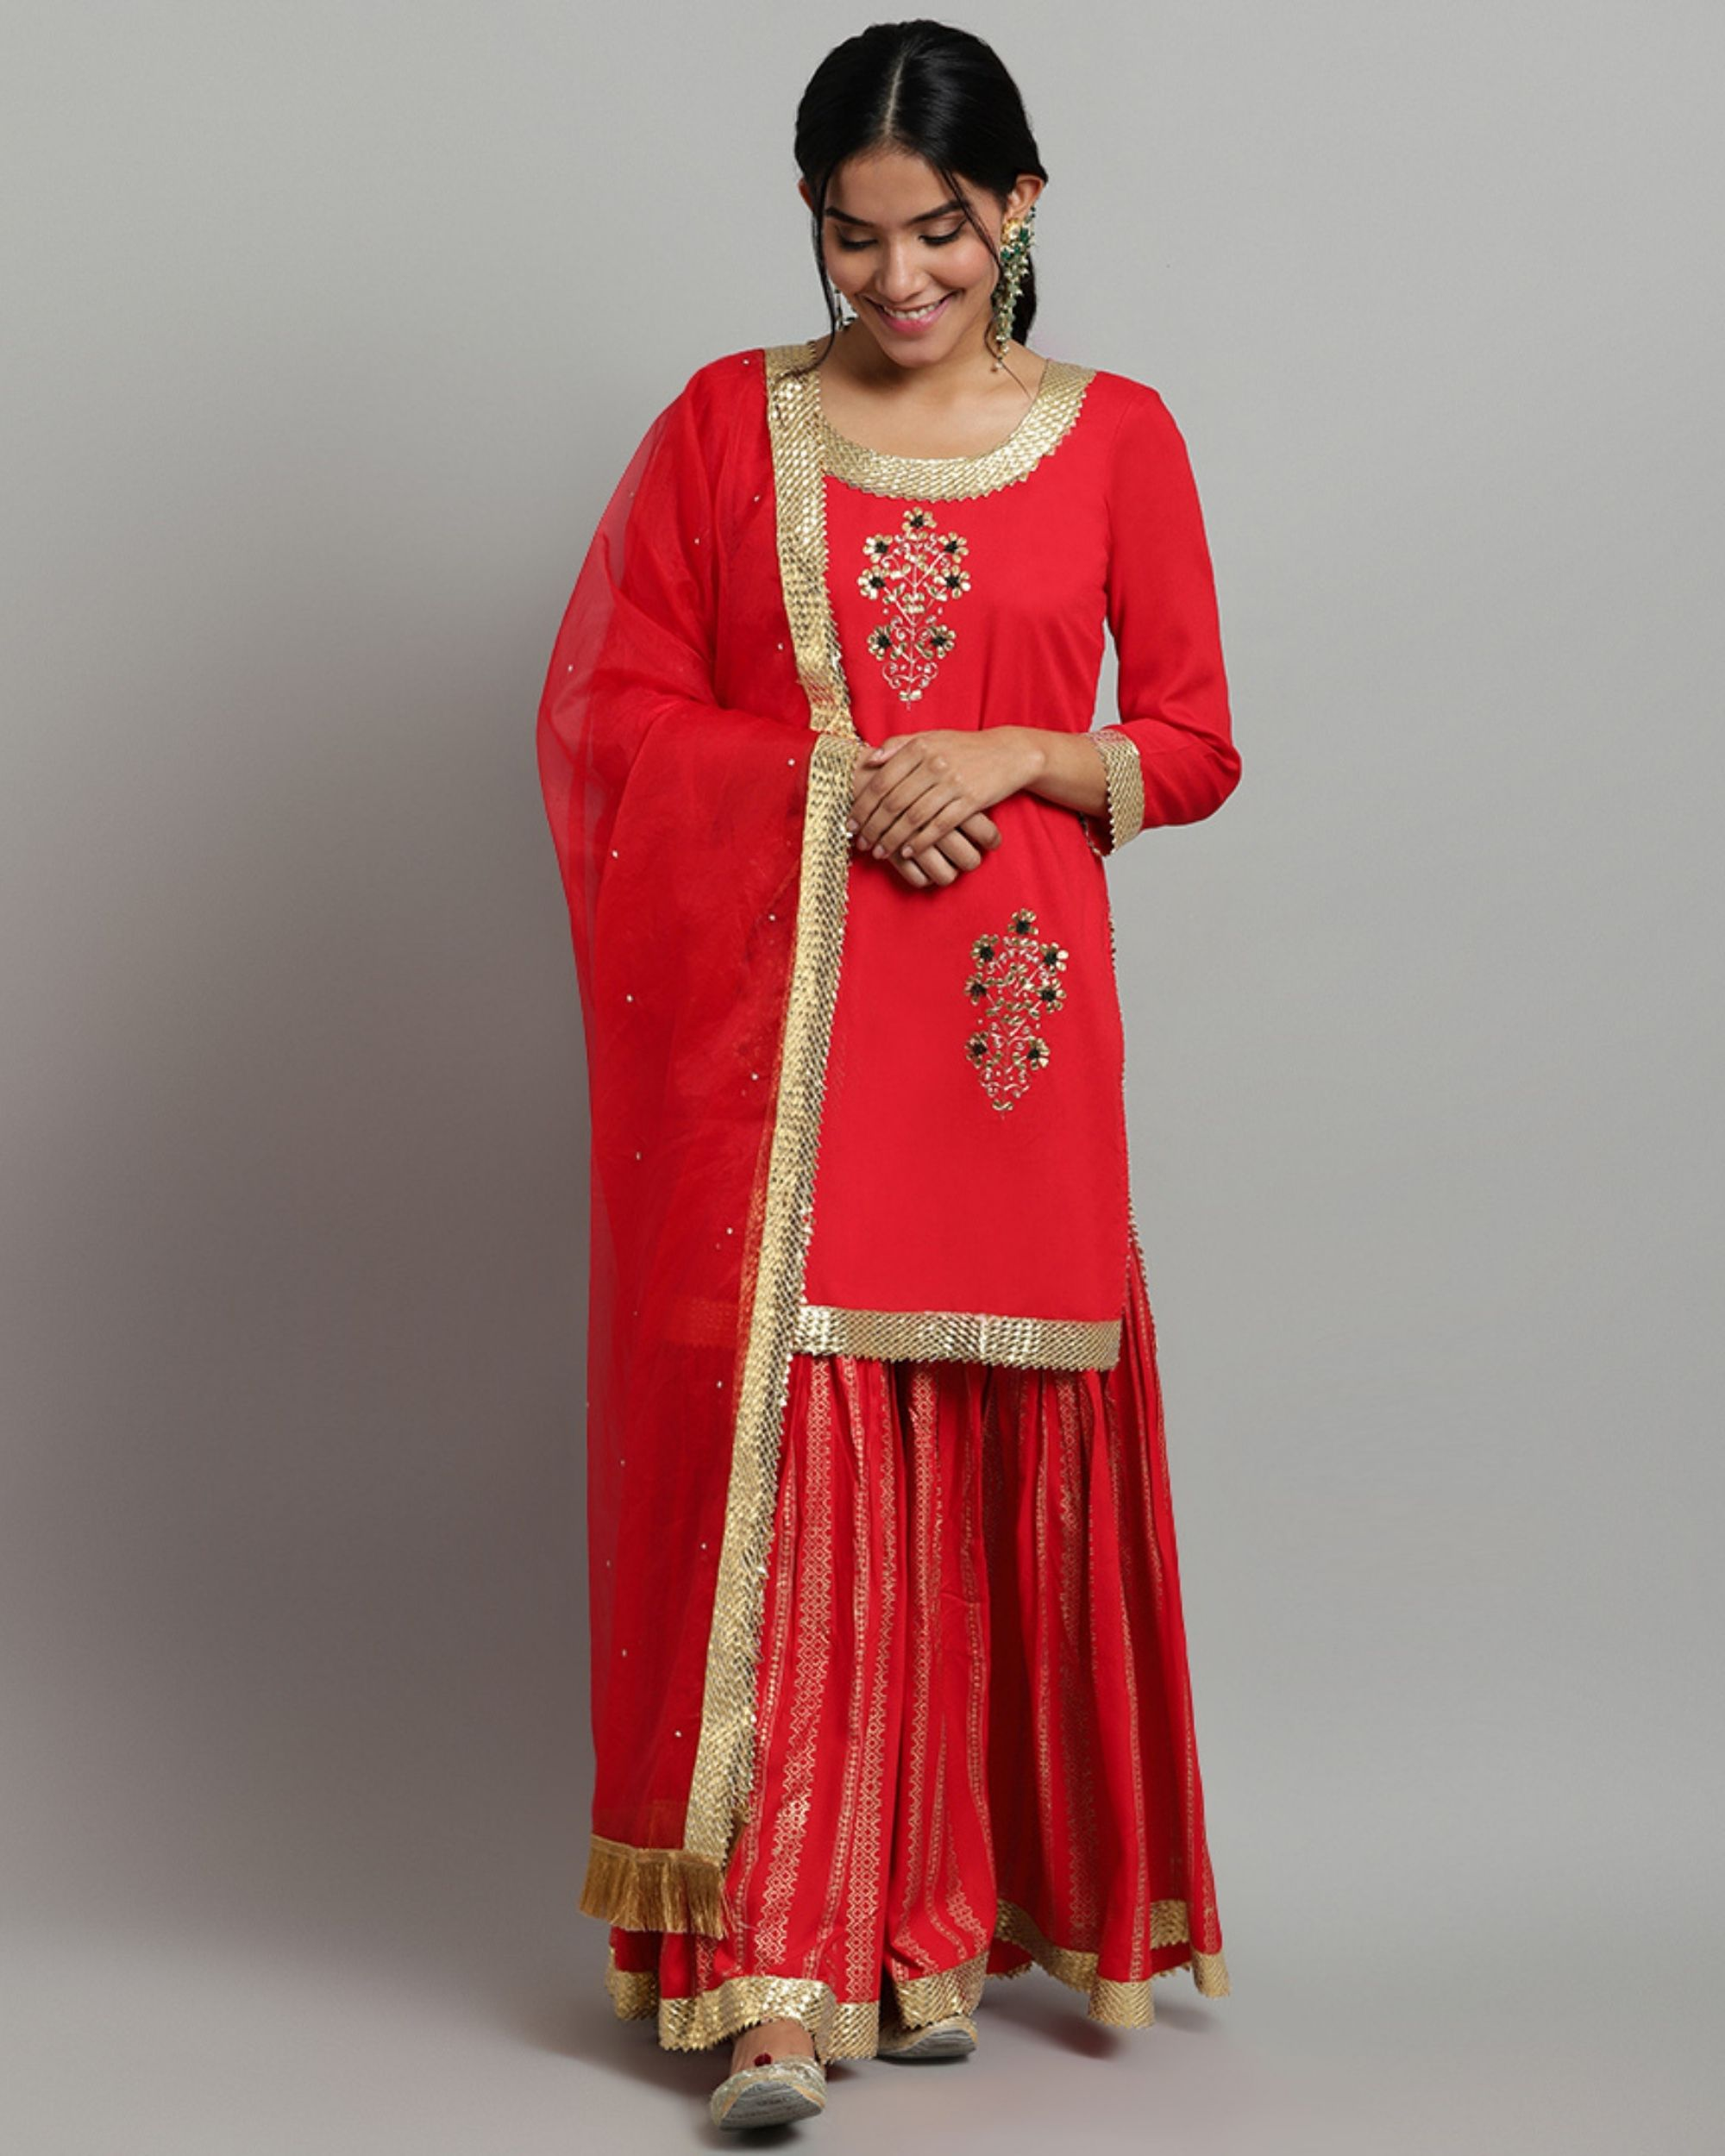 Designer Printed Women/'s Rayon Red Kurti With Dupatta Set Gold Print Work Valentine/'s Day Gift.